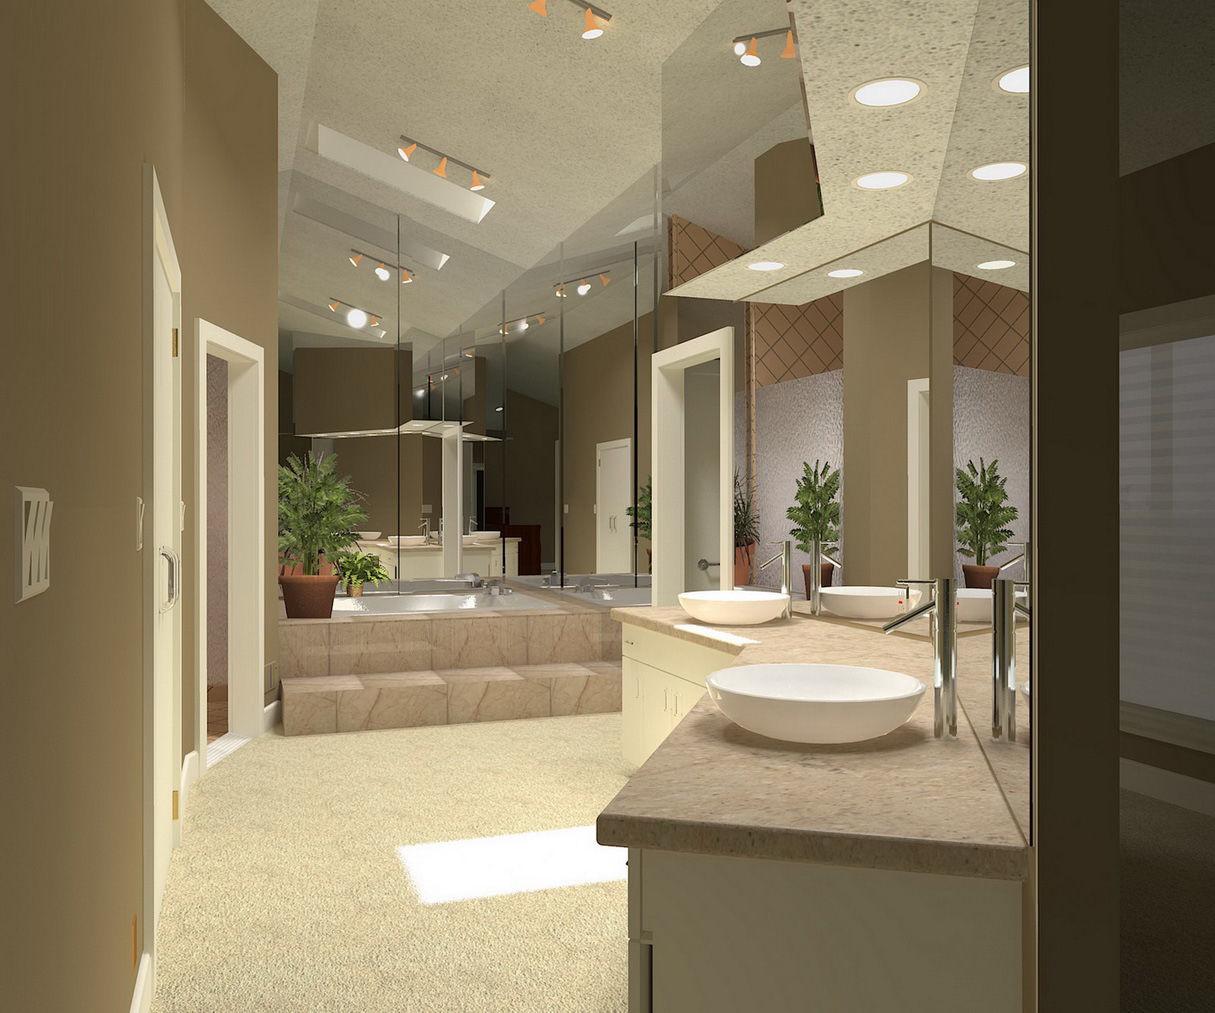 Stylish 5x5 Bathroom Layout Model - Home Sweet Home ... on Bathroom Model Design  id=79179